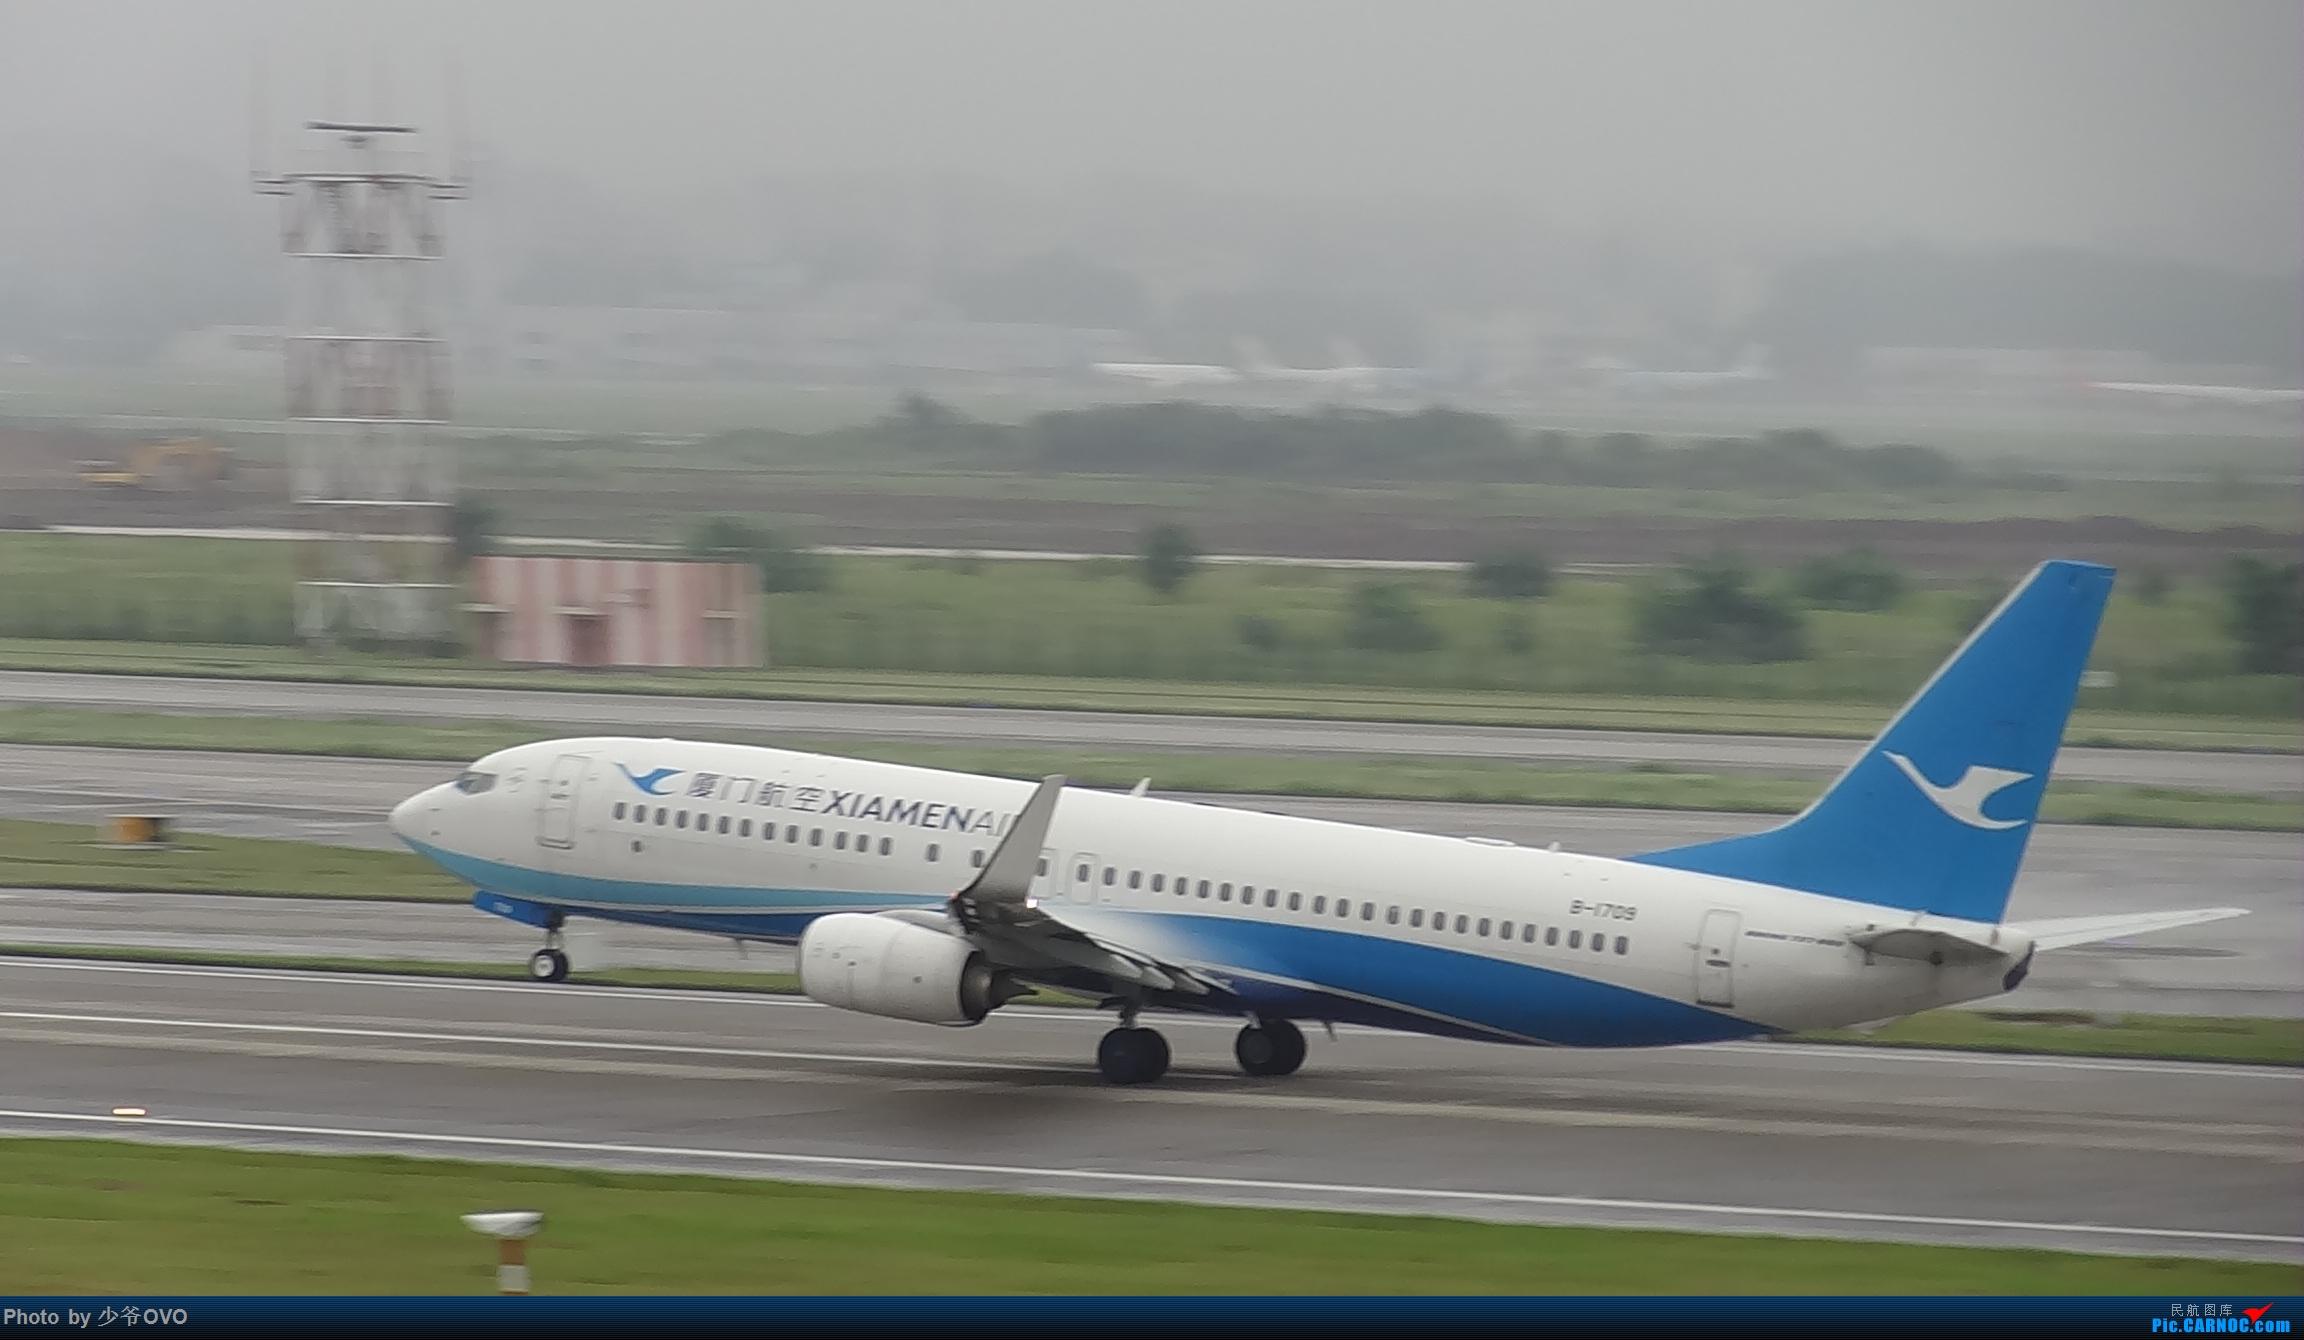 Re:[原创]CKG重庆江北机场拍机 ,中法建交50周年 BOEING 737-800 B-1709 中国重庆江北国际机场